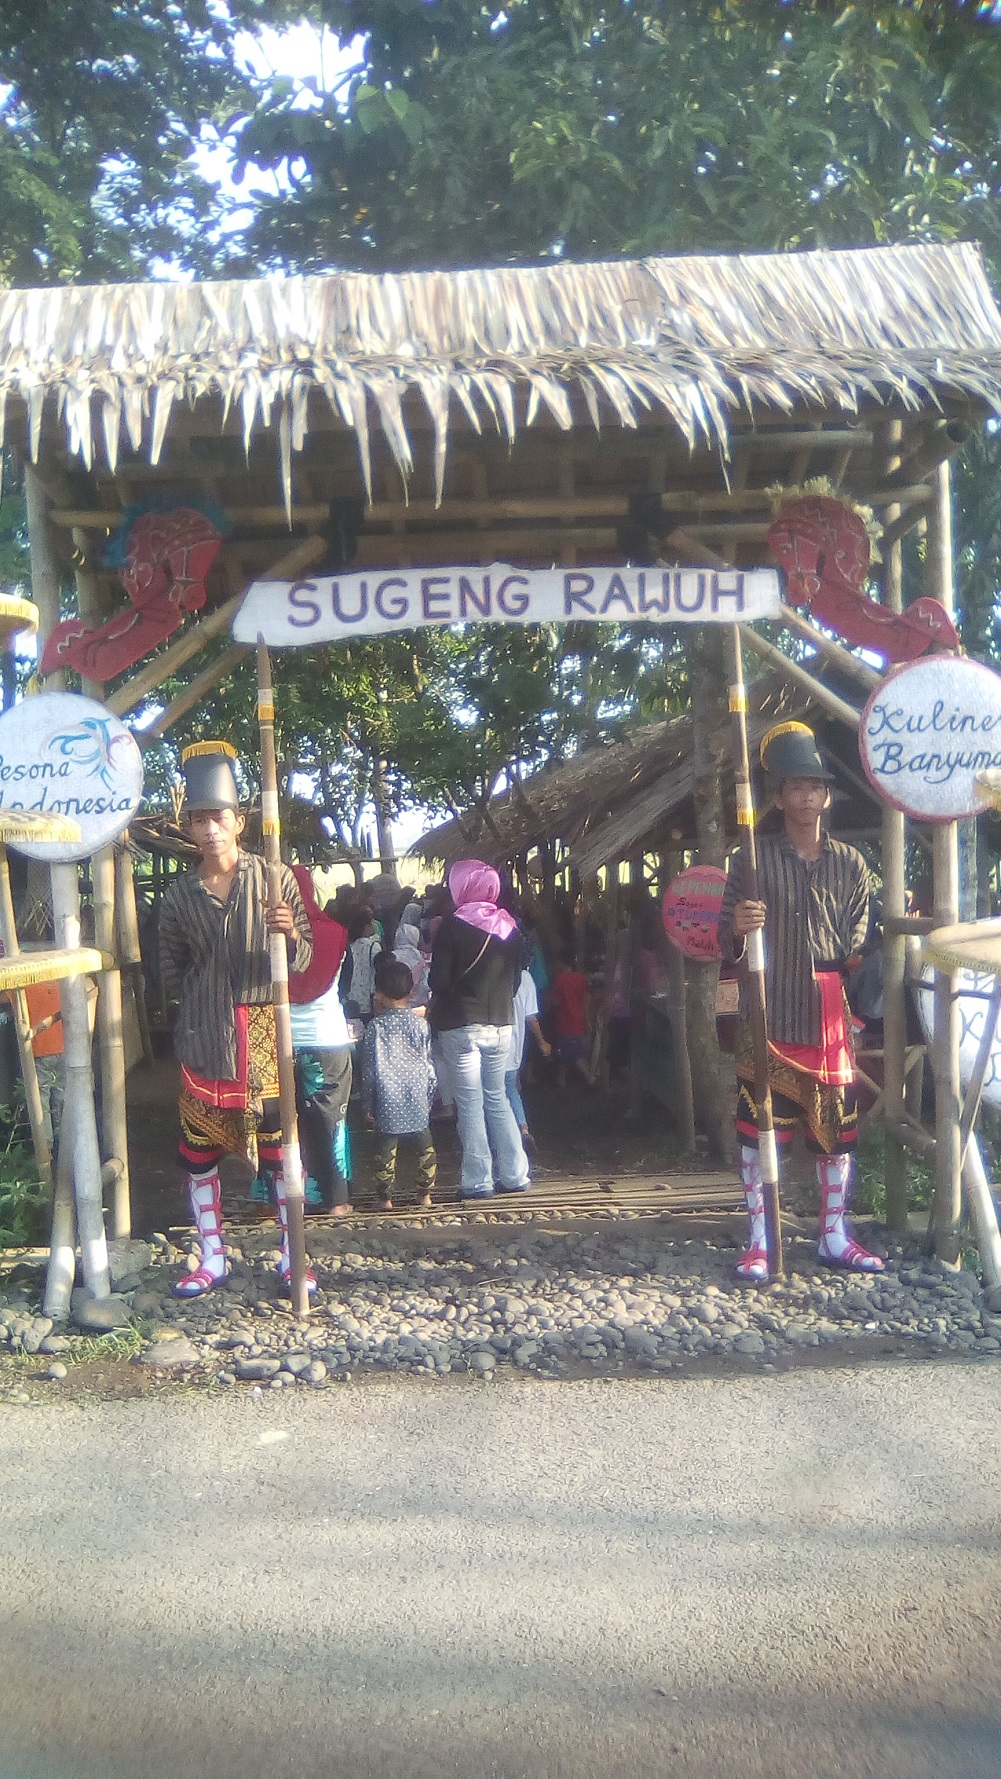 Penjaga di pintu masuk Pasar Kuna Lereng berpakaian seperti prajurit kerajaan